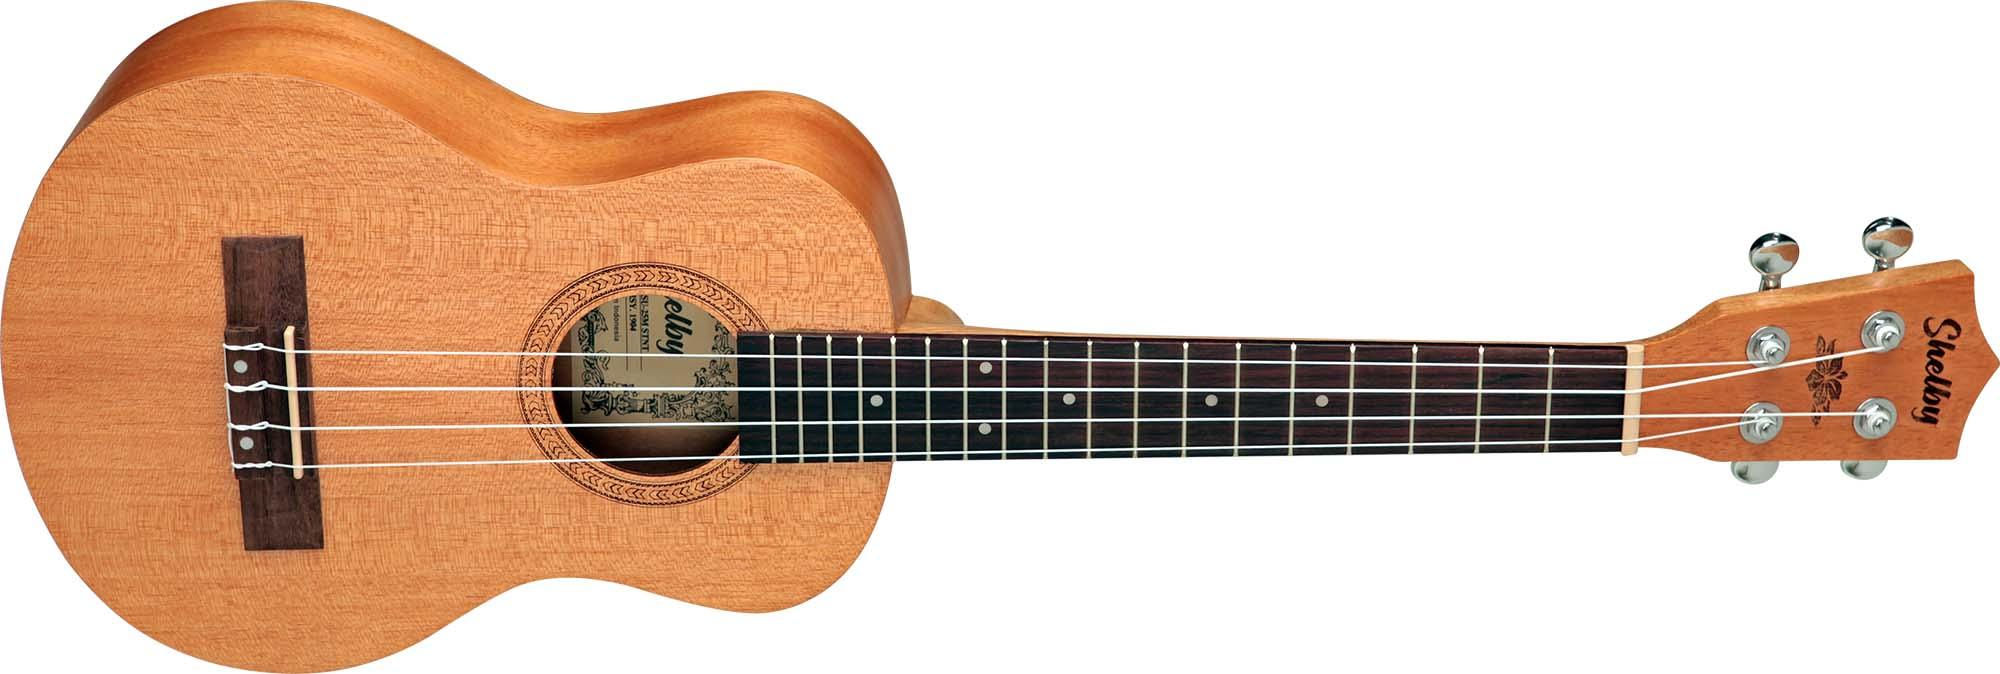 su25m ukulele tenor shelby su25m stnt mogno acetinado visao frontal